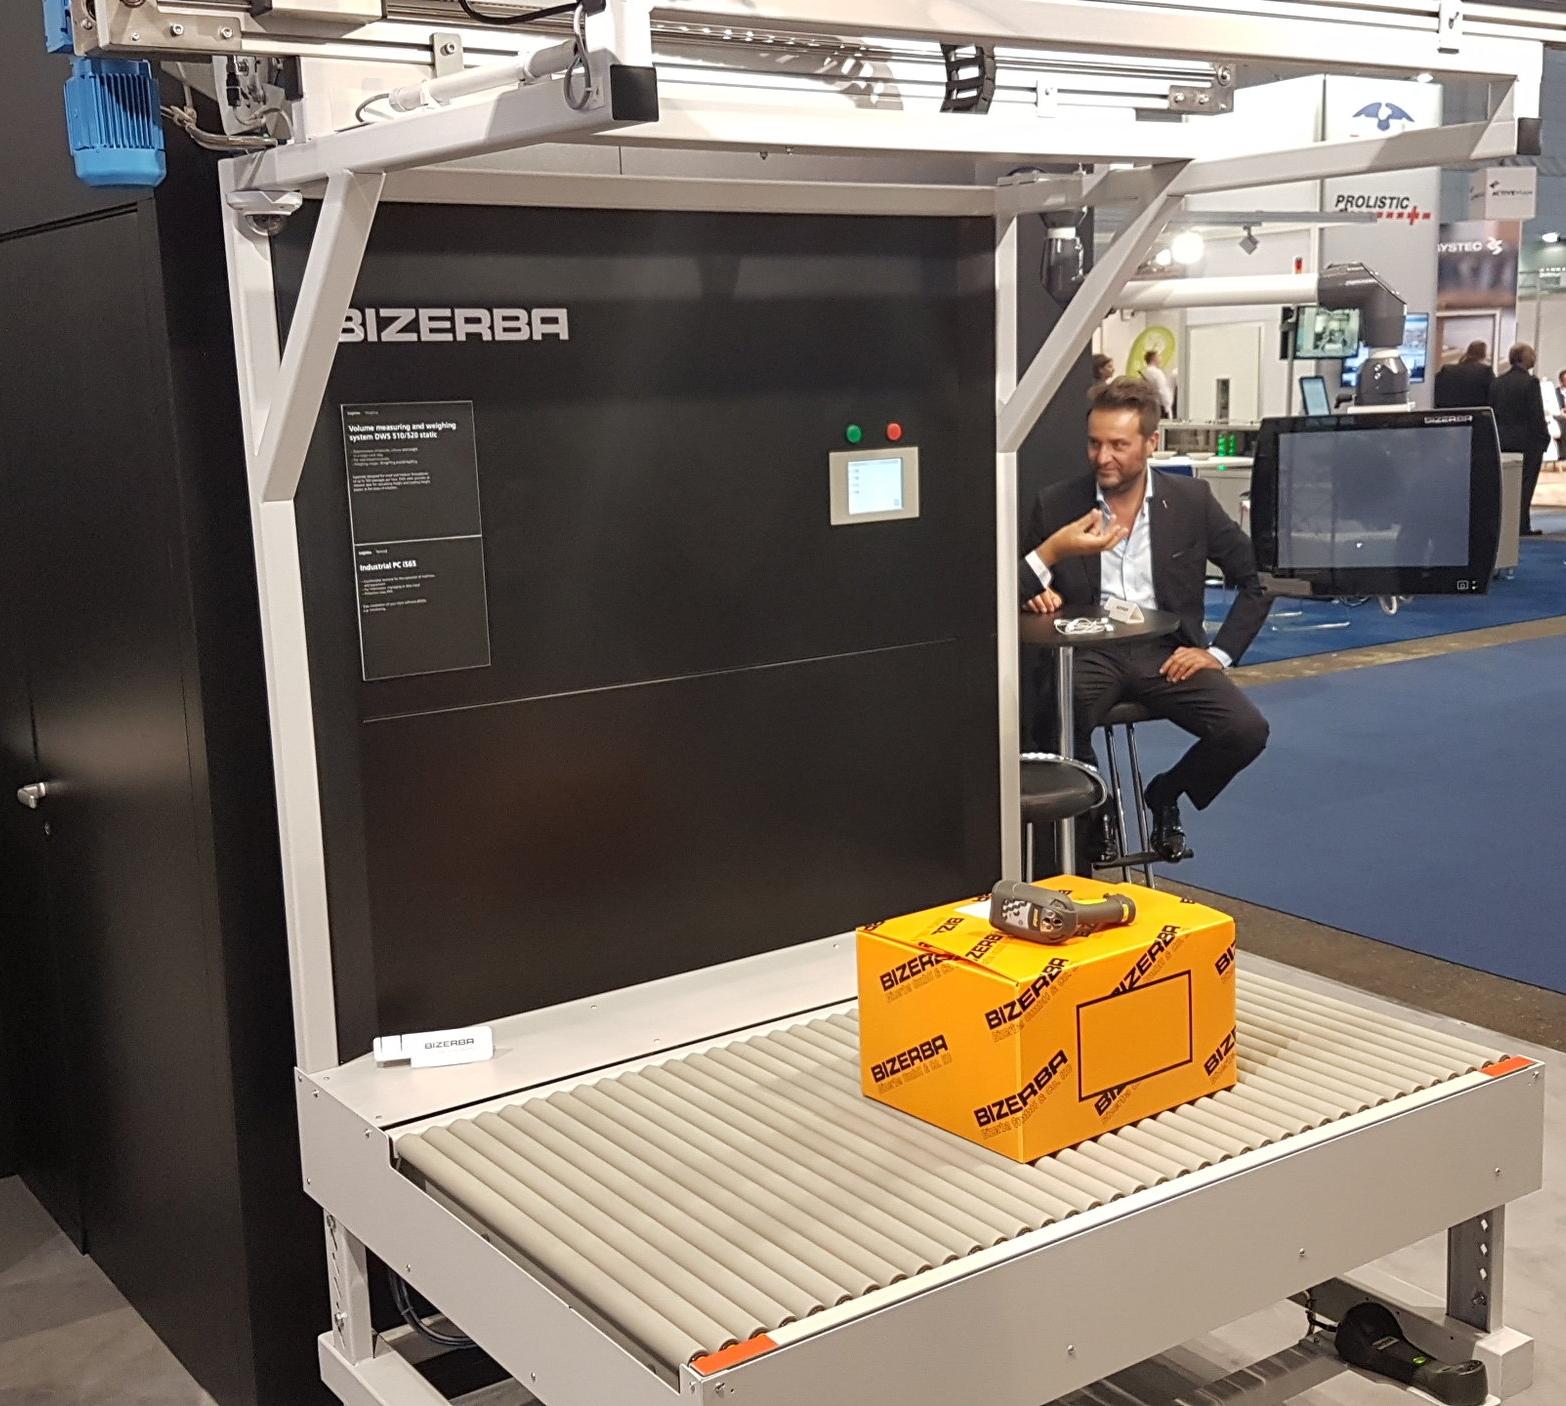 Volumetric scanning system from Bizerba